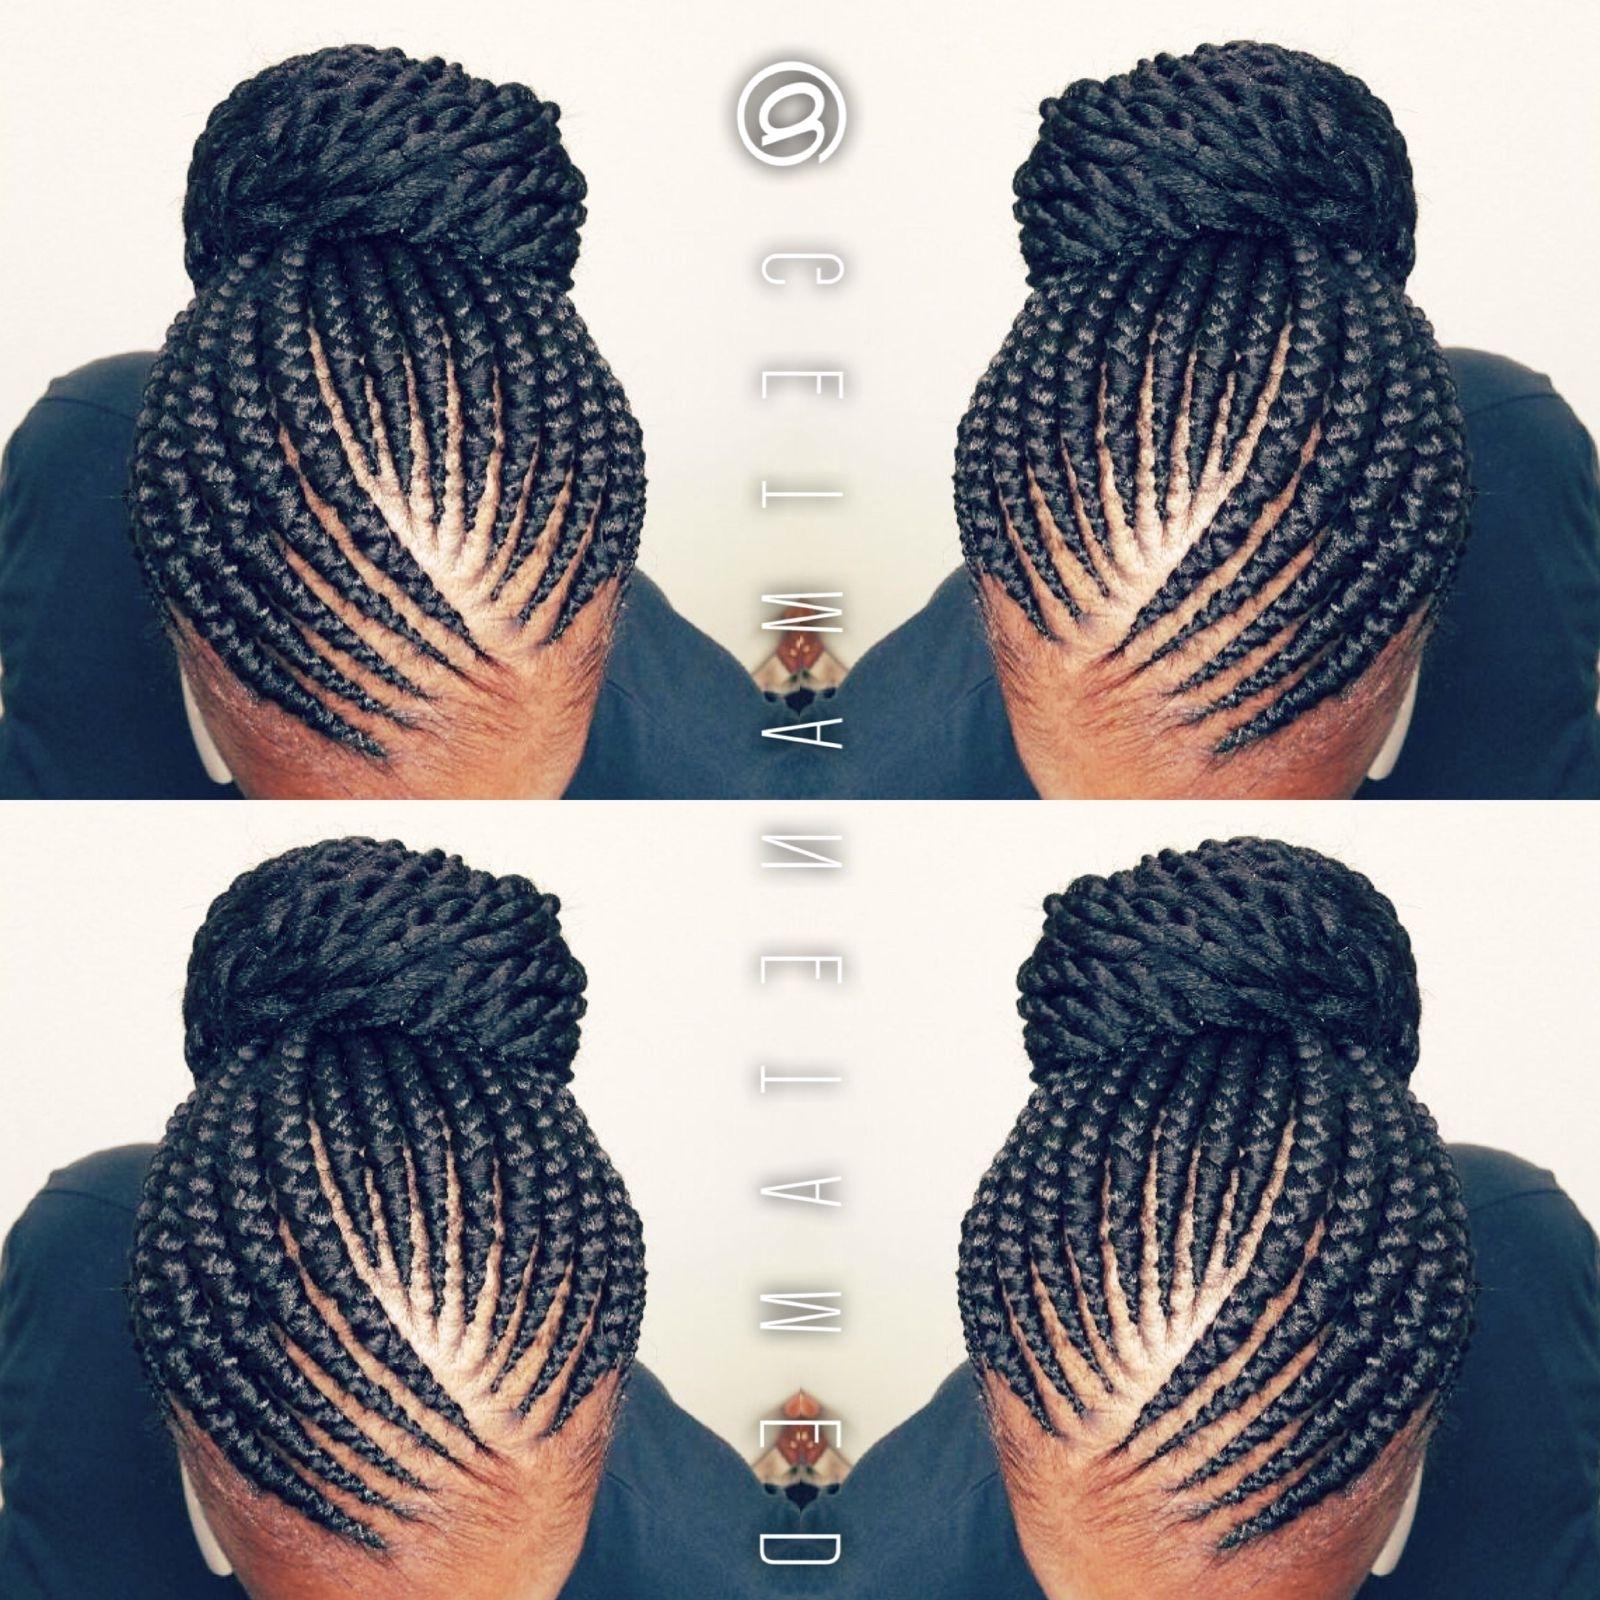 Ghana Braids. Ghana Cornrows. Banana Cornrows. Feed In Cornrows With Famous Ghana Braids Bun Hairstyles (Gallery 6 of 15)